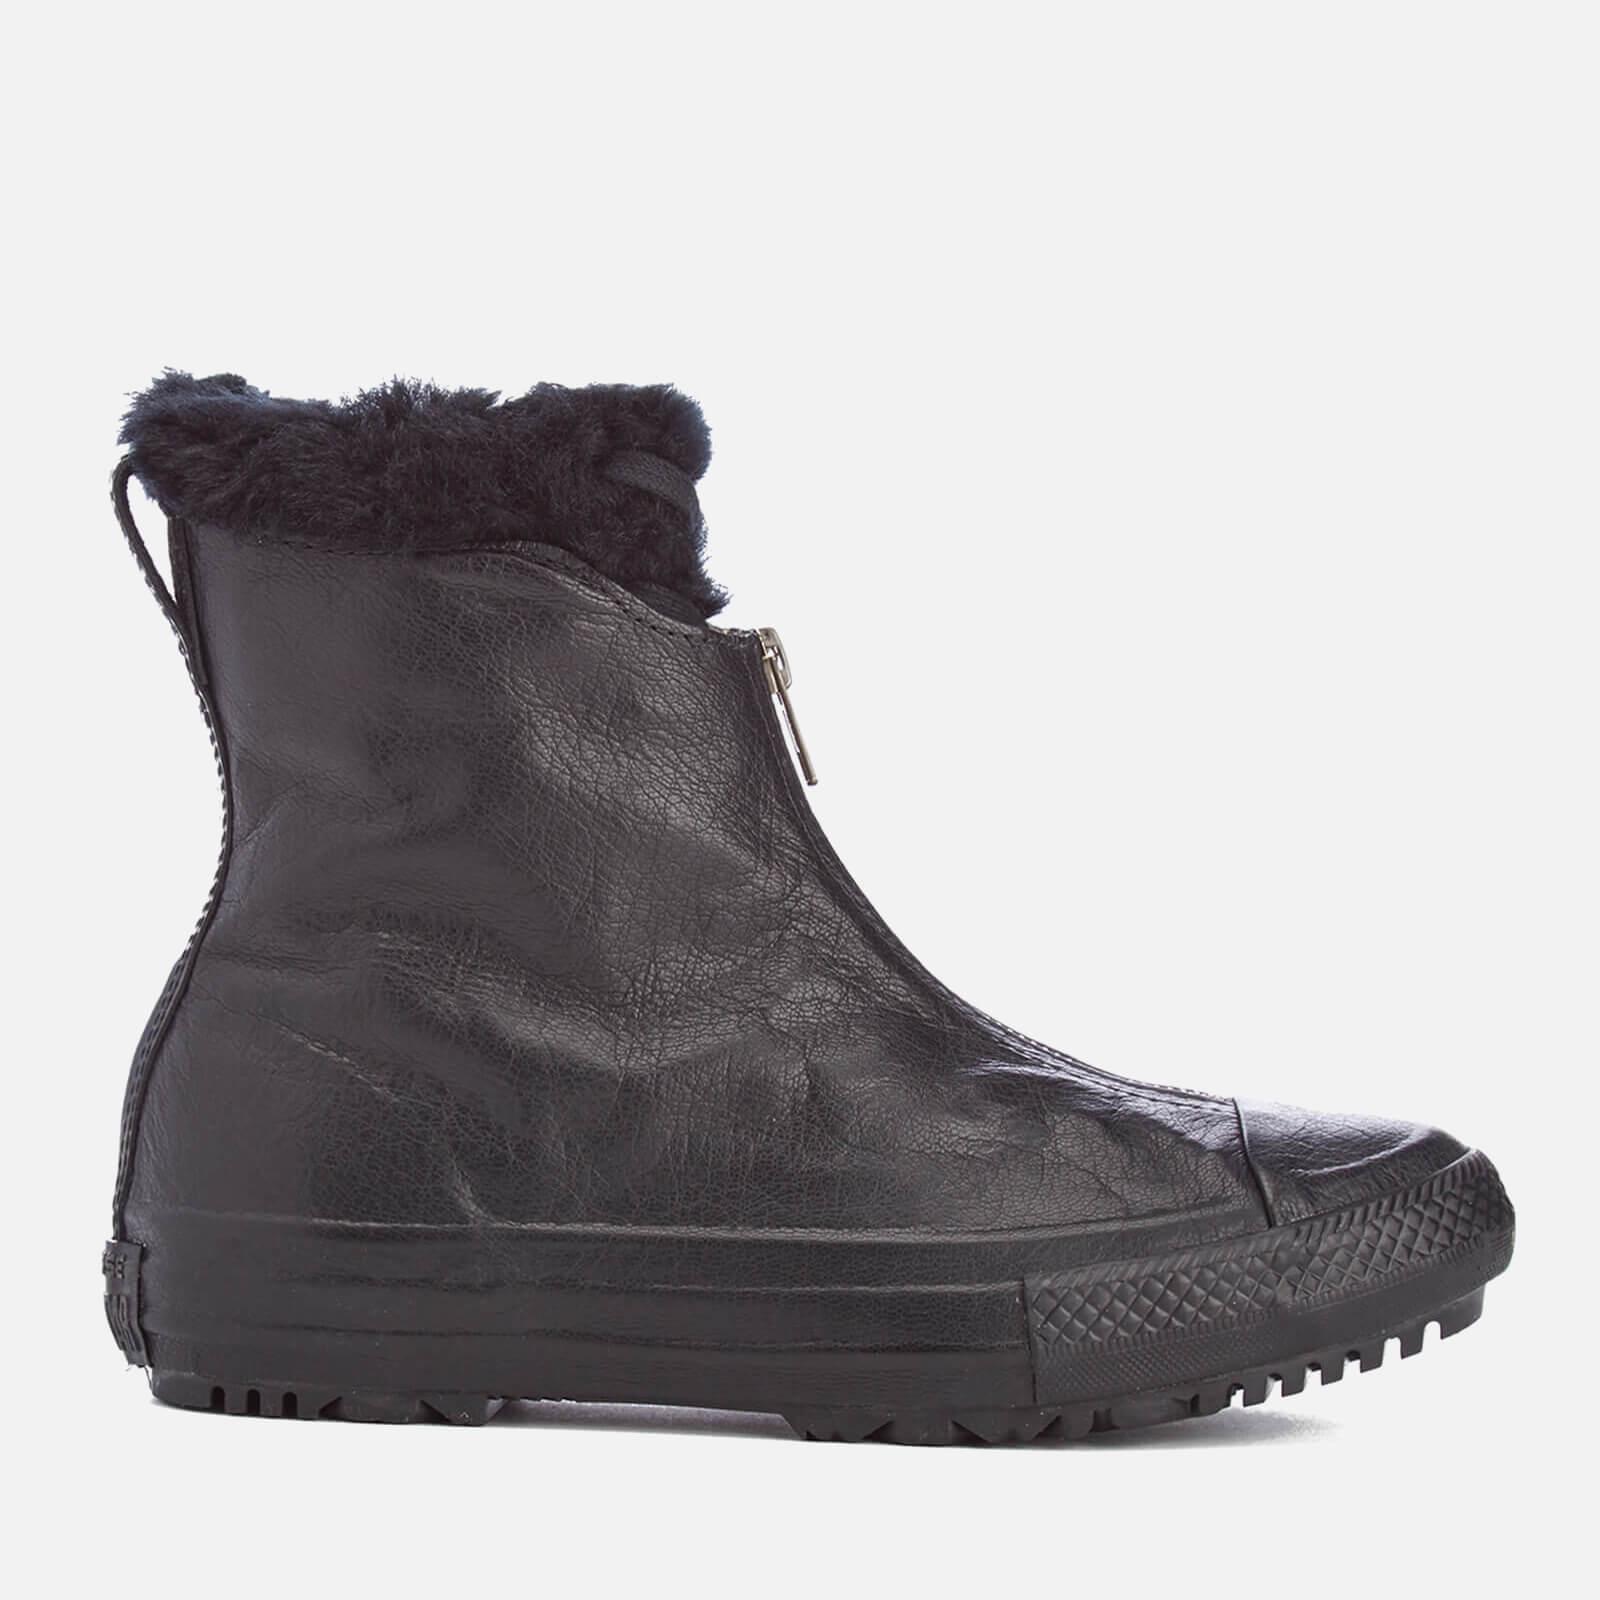 cafbf7e83eca ... Converse Women s Chuck Taylor All Star Hi Rise Shroud Boots - Black  Monochrome